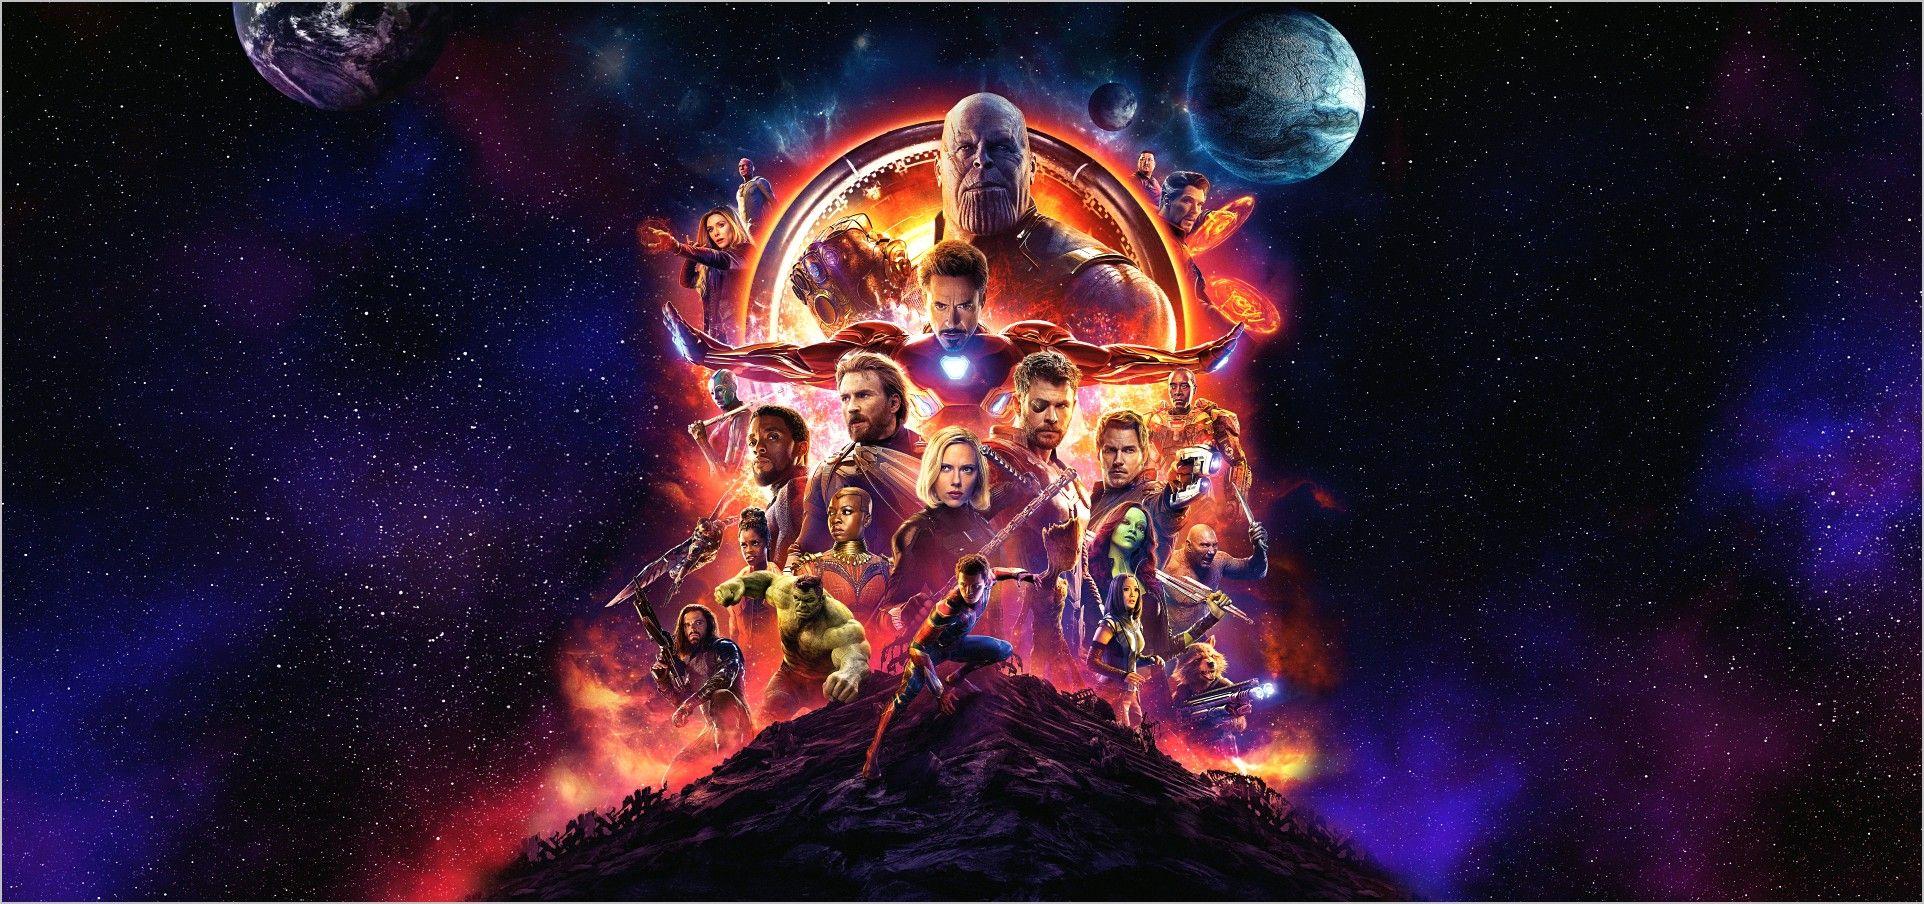 4k Wallpaper Avenger Infinity Wasr Wallpaper In 2020 Marvel Marvel Cinematic Universe Movies Avengers